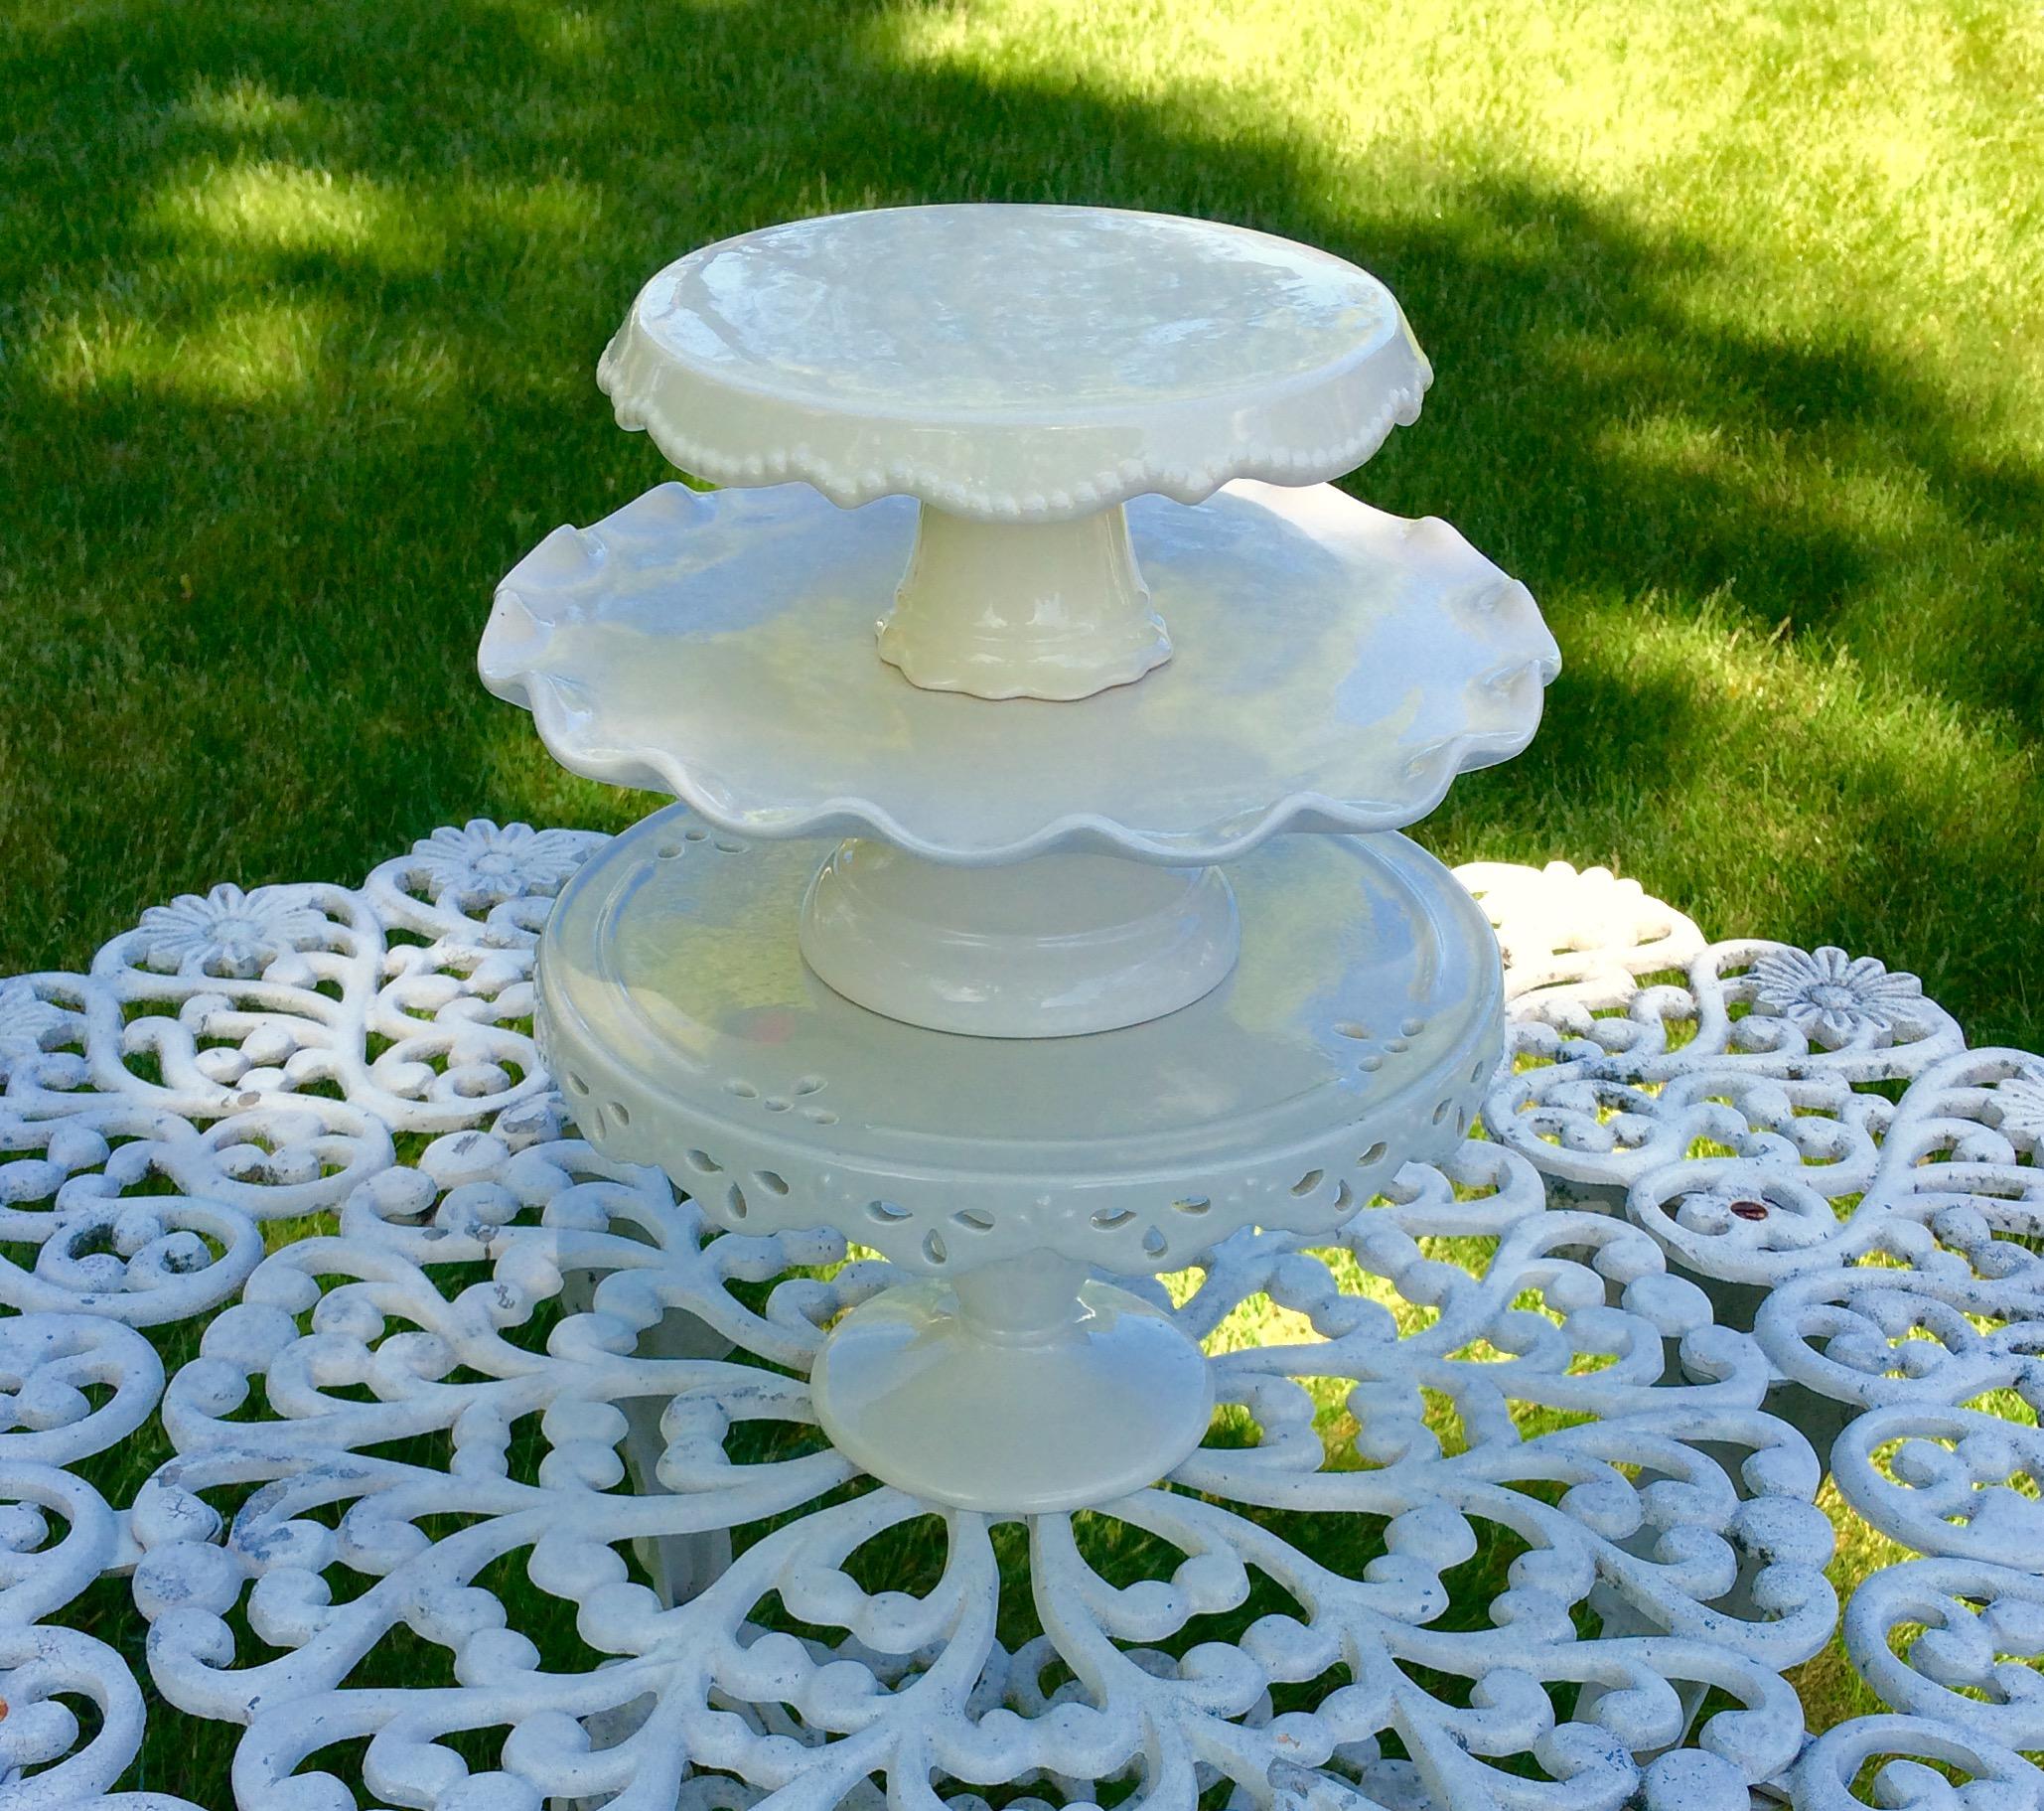 Ceramic Cake Stands